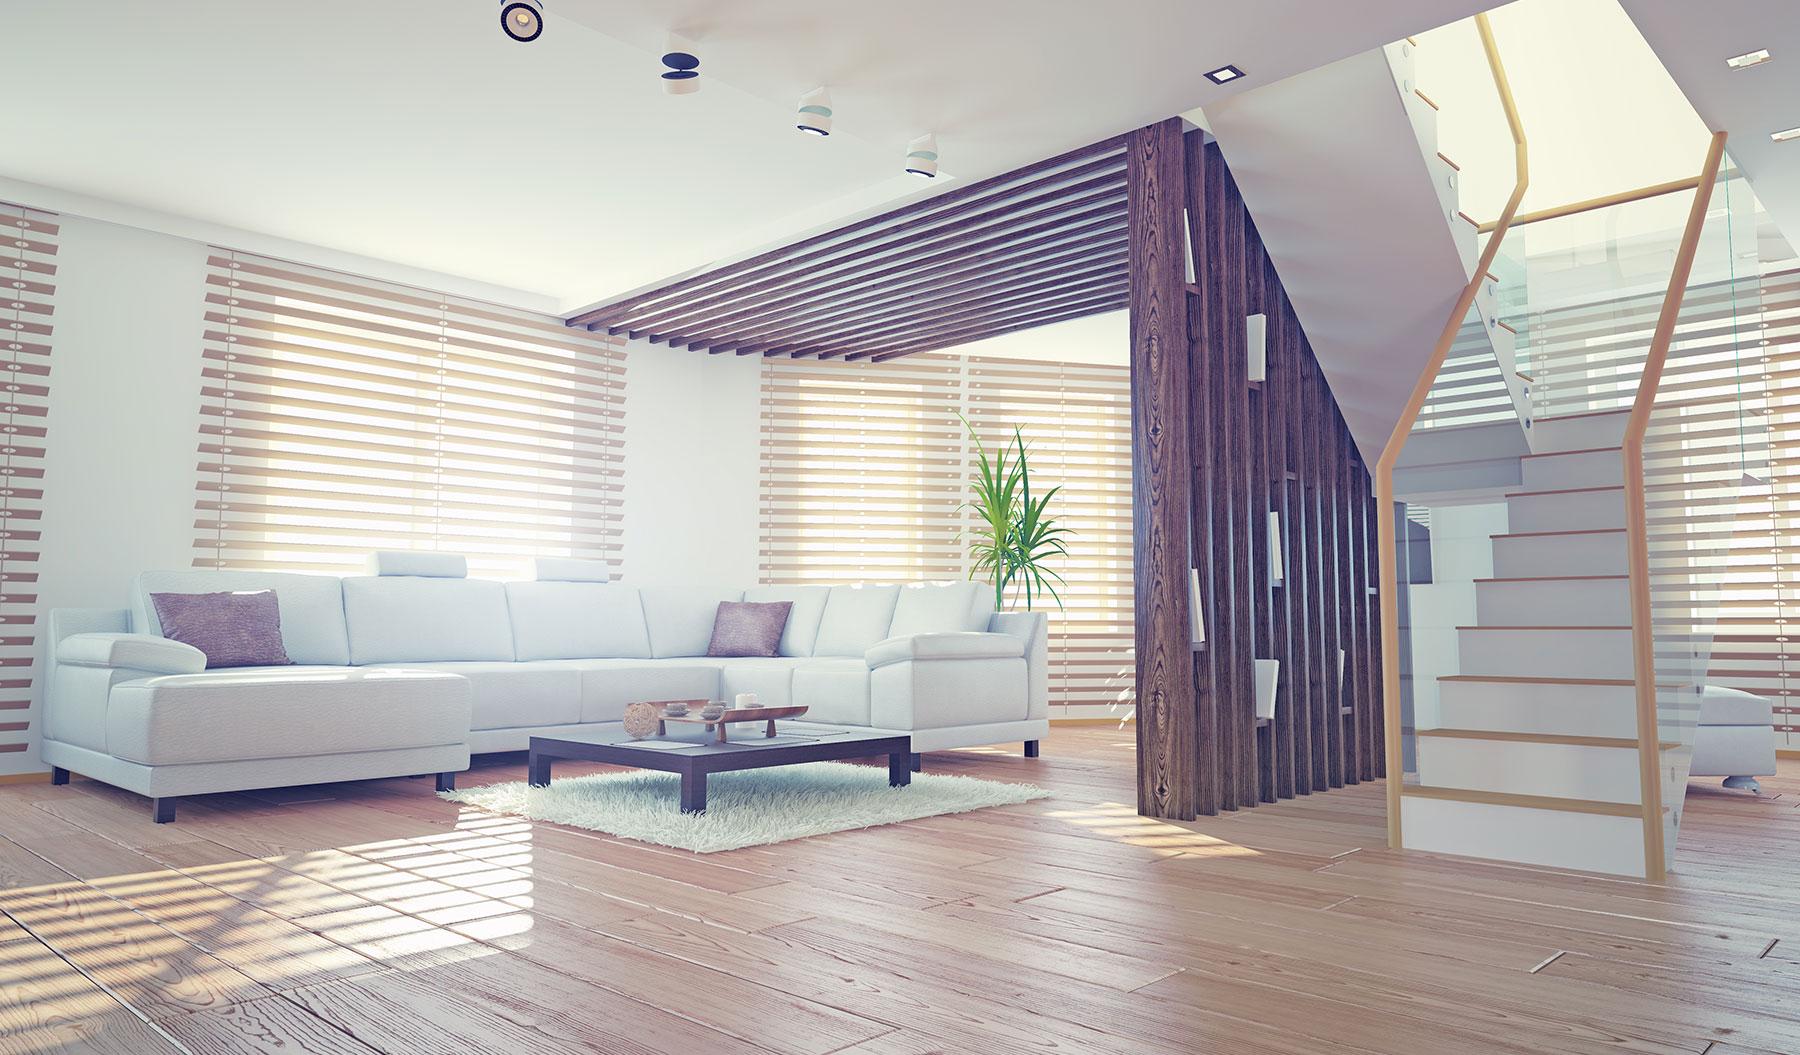 Giacomini chauffage radiant plafonds climatisants